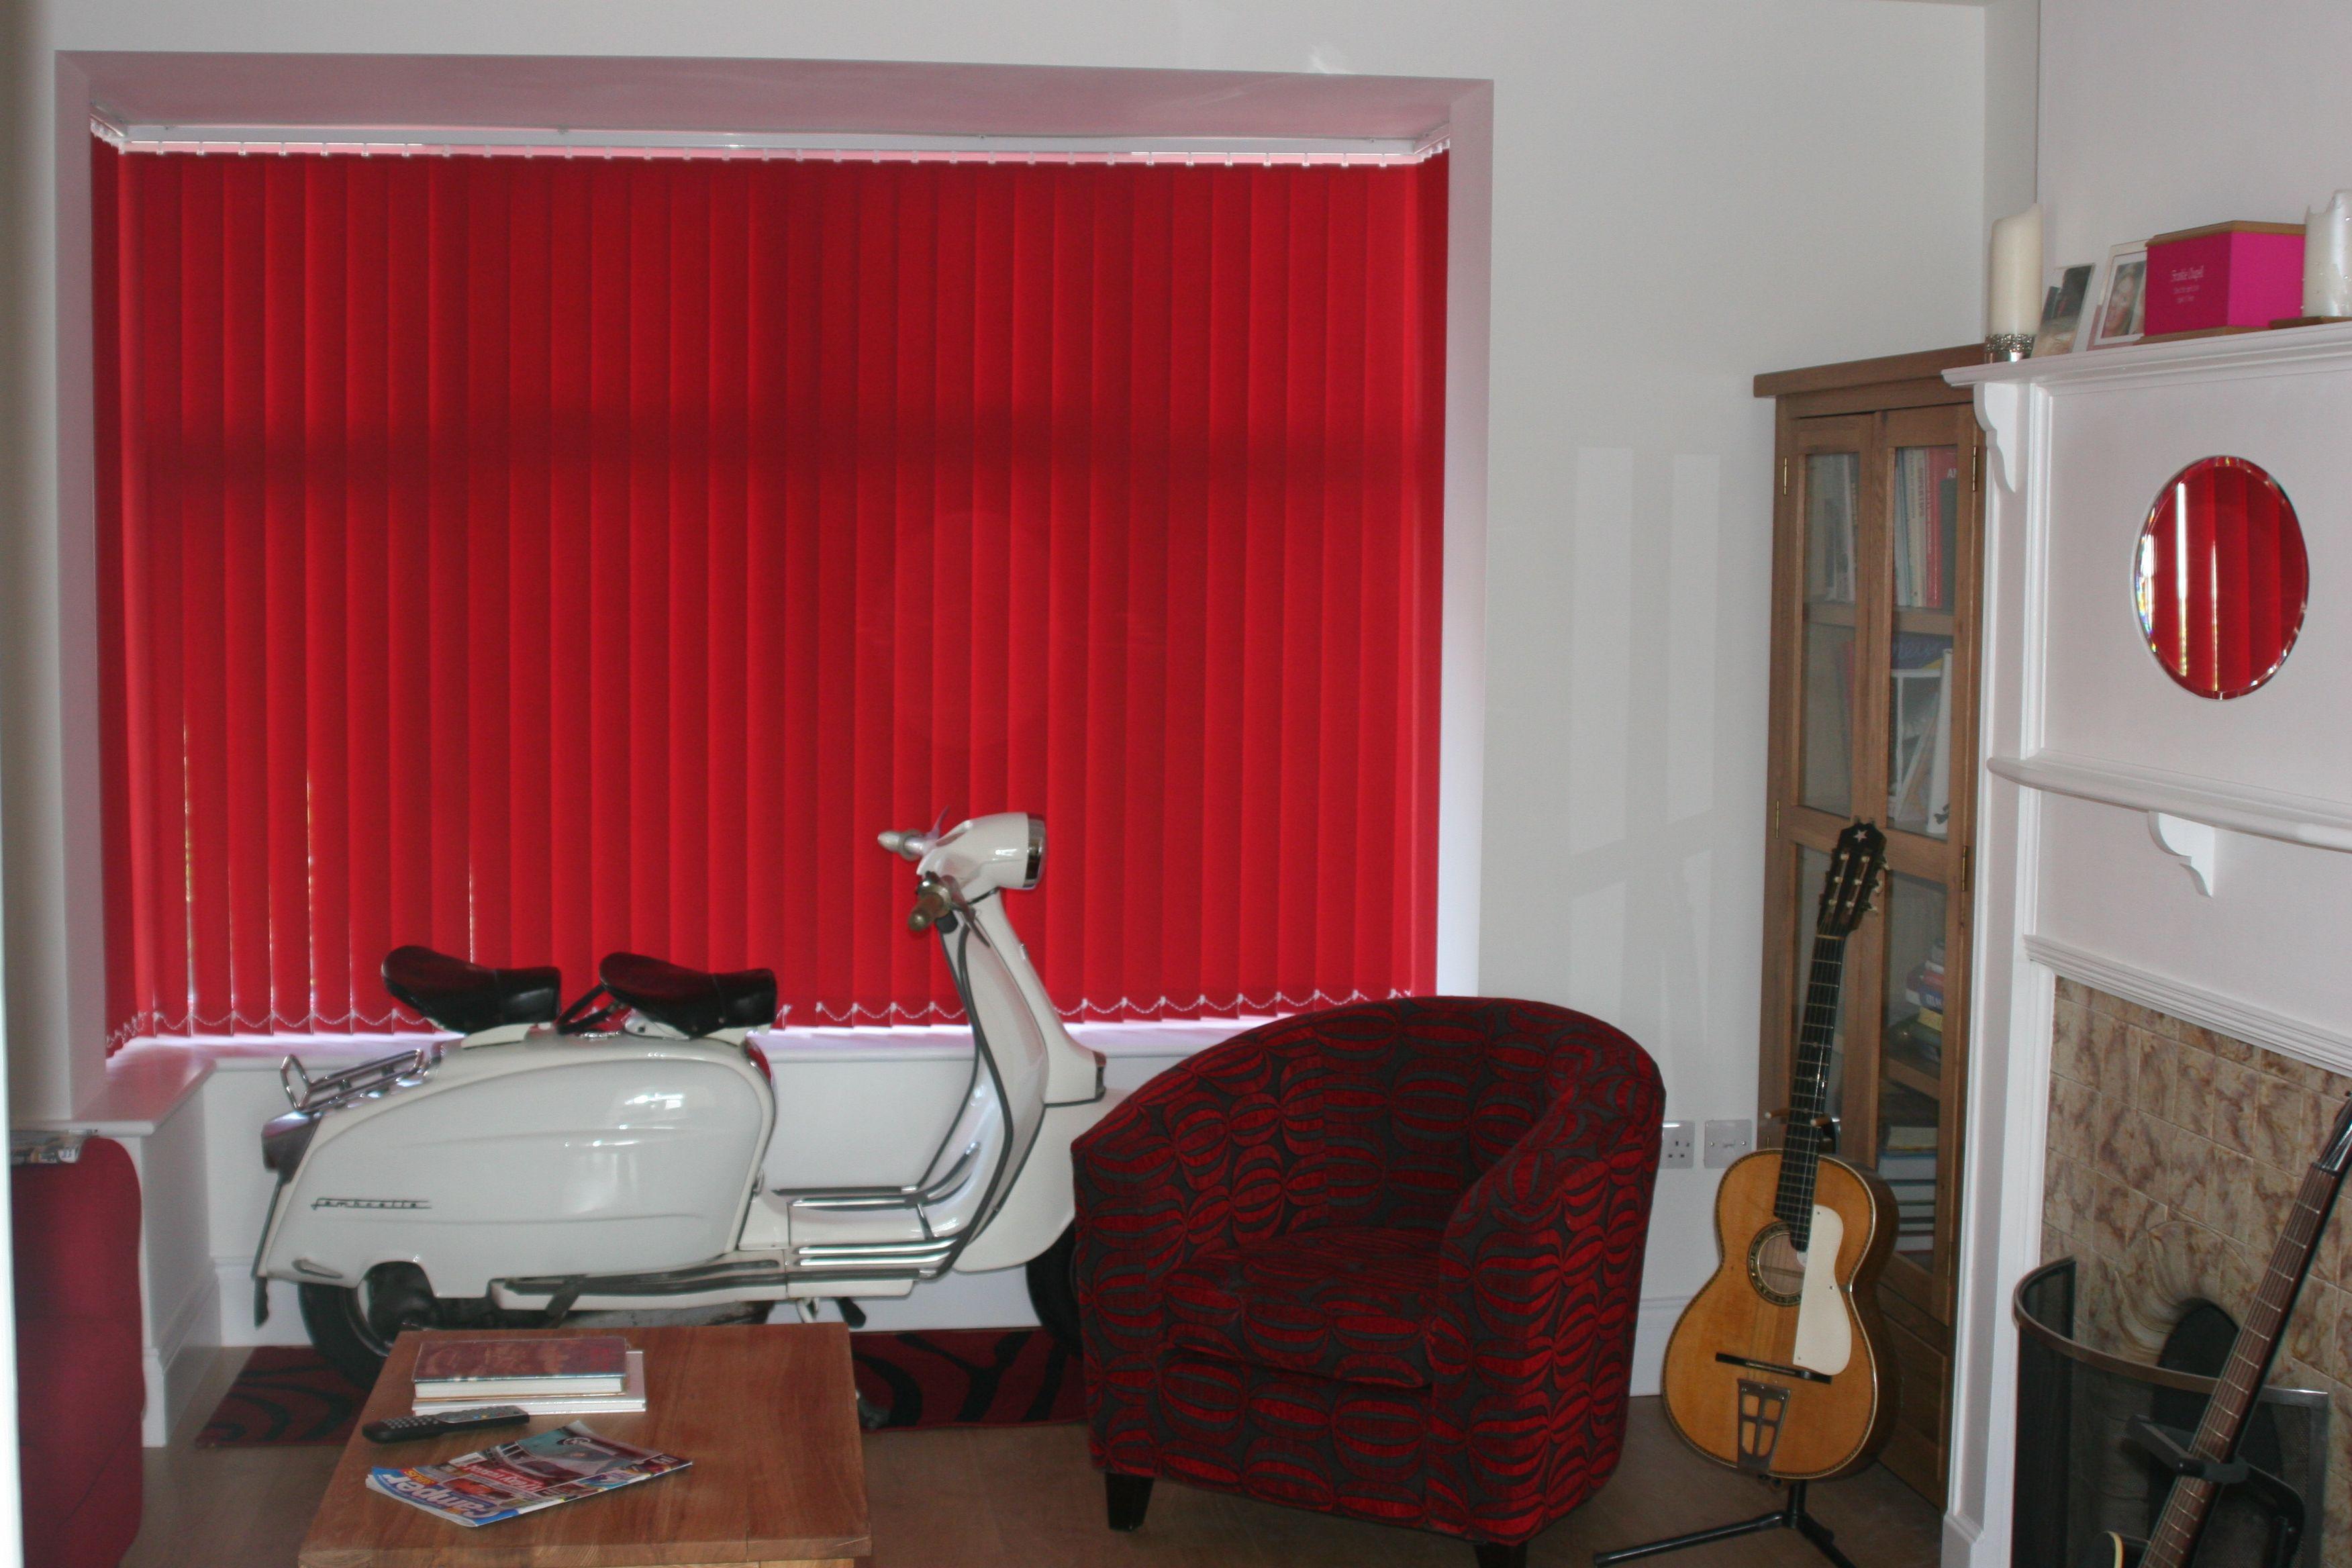 Vertical Window Blinds For Living Room Interior Decoration Ideas Blinds For Windows Interior Decorating Living Room Red Blinds